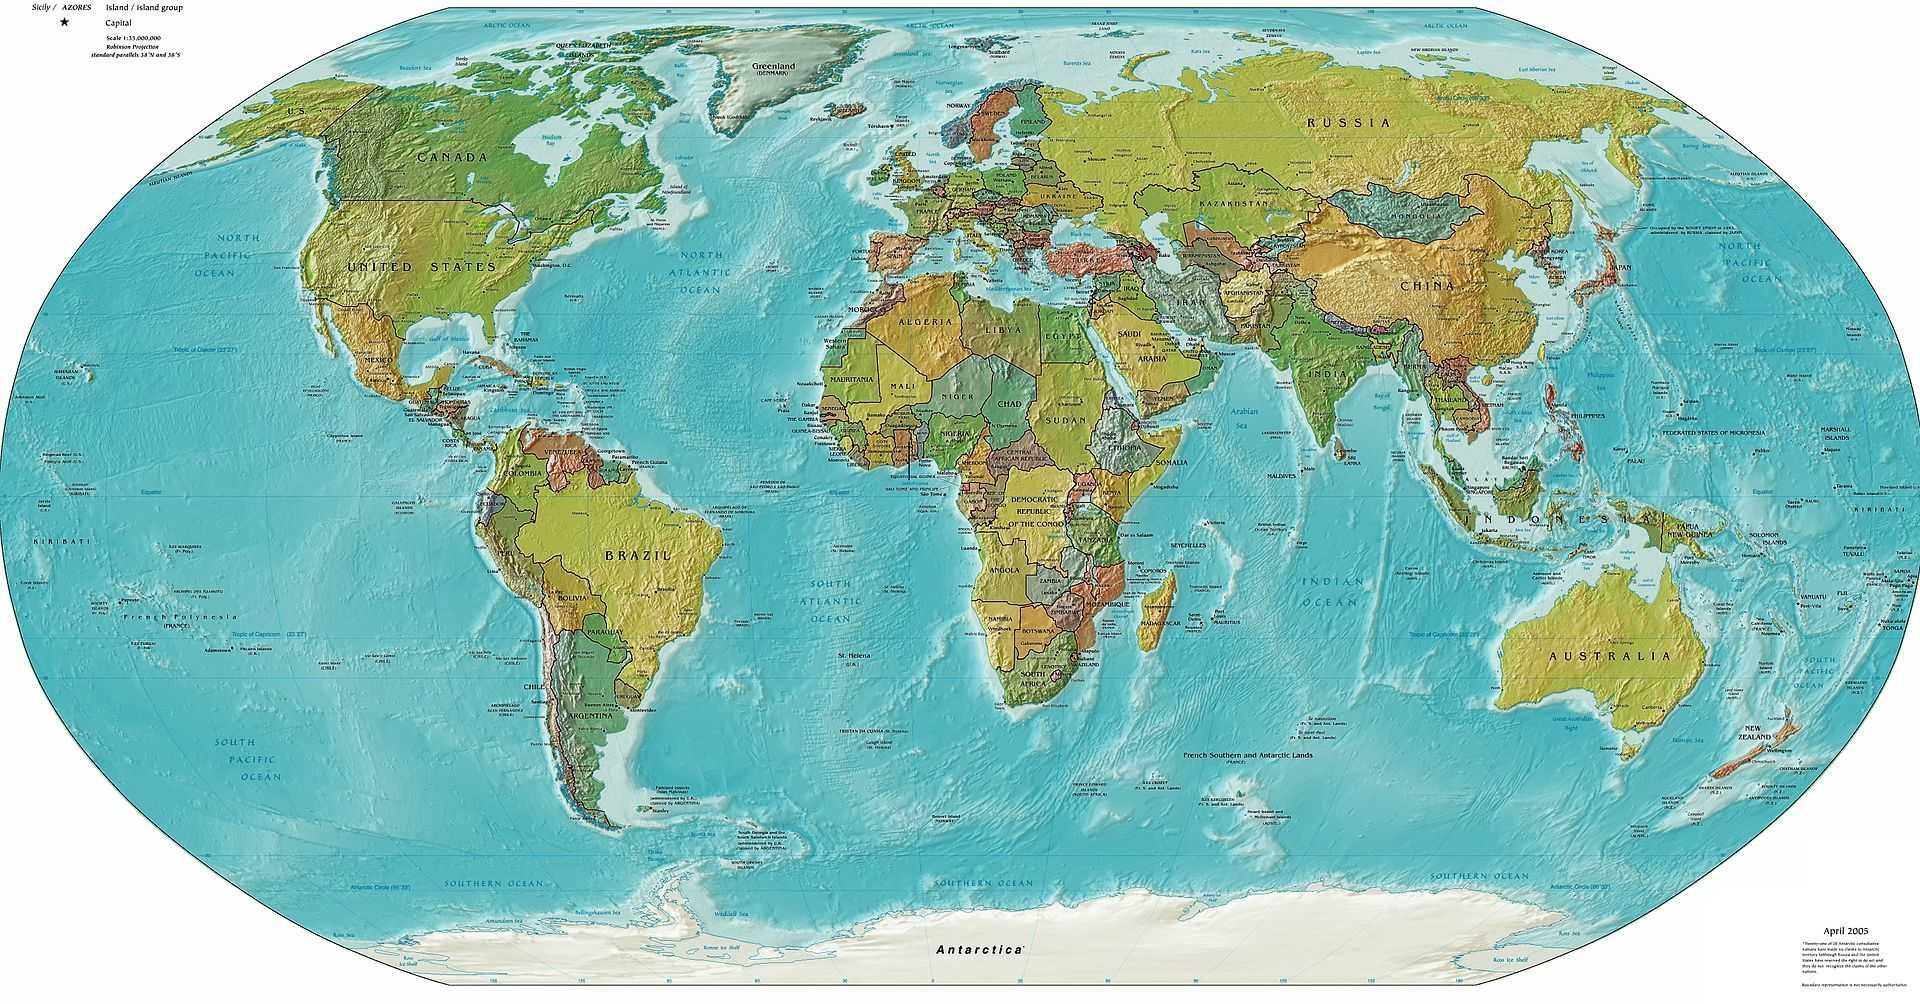 Gratis Weltkarte 138 X 98 Cm Weitere Karten Bestellen